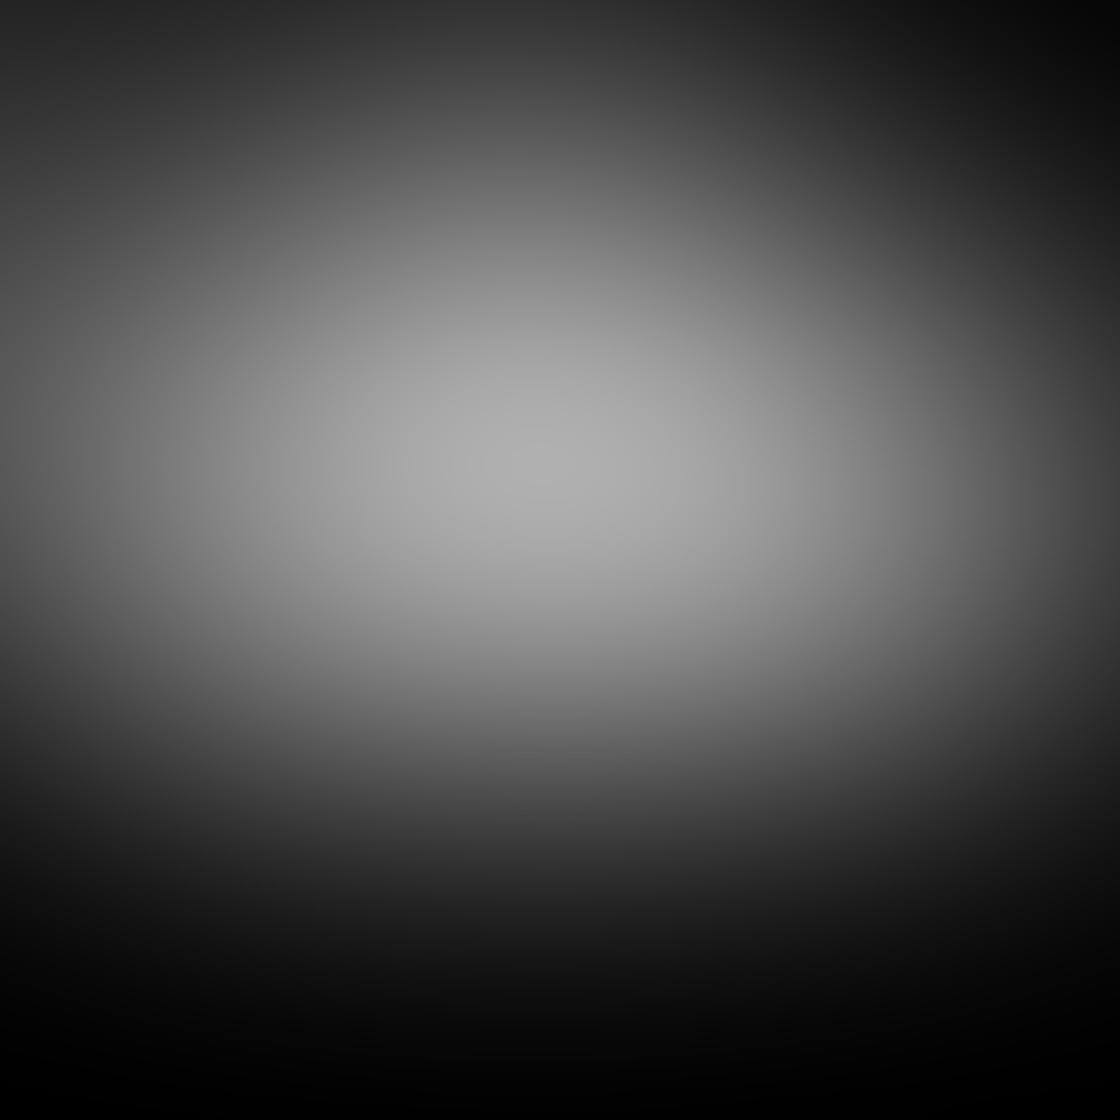 iPhone Photo Vignette 58